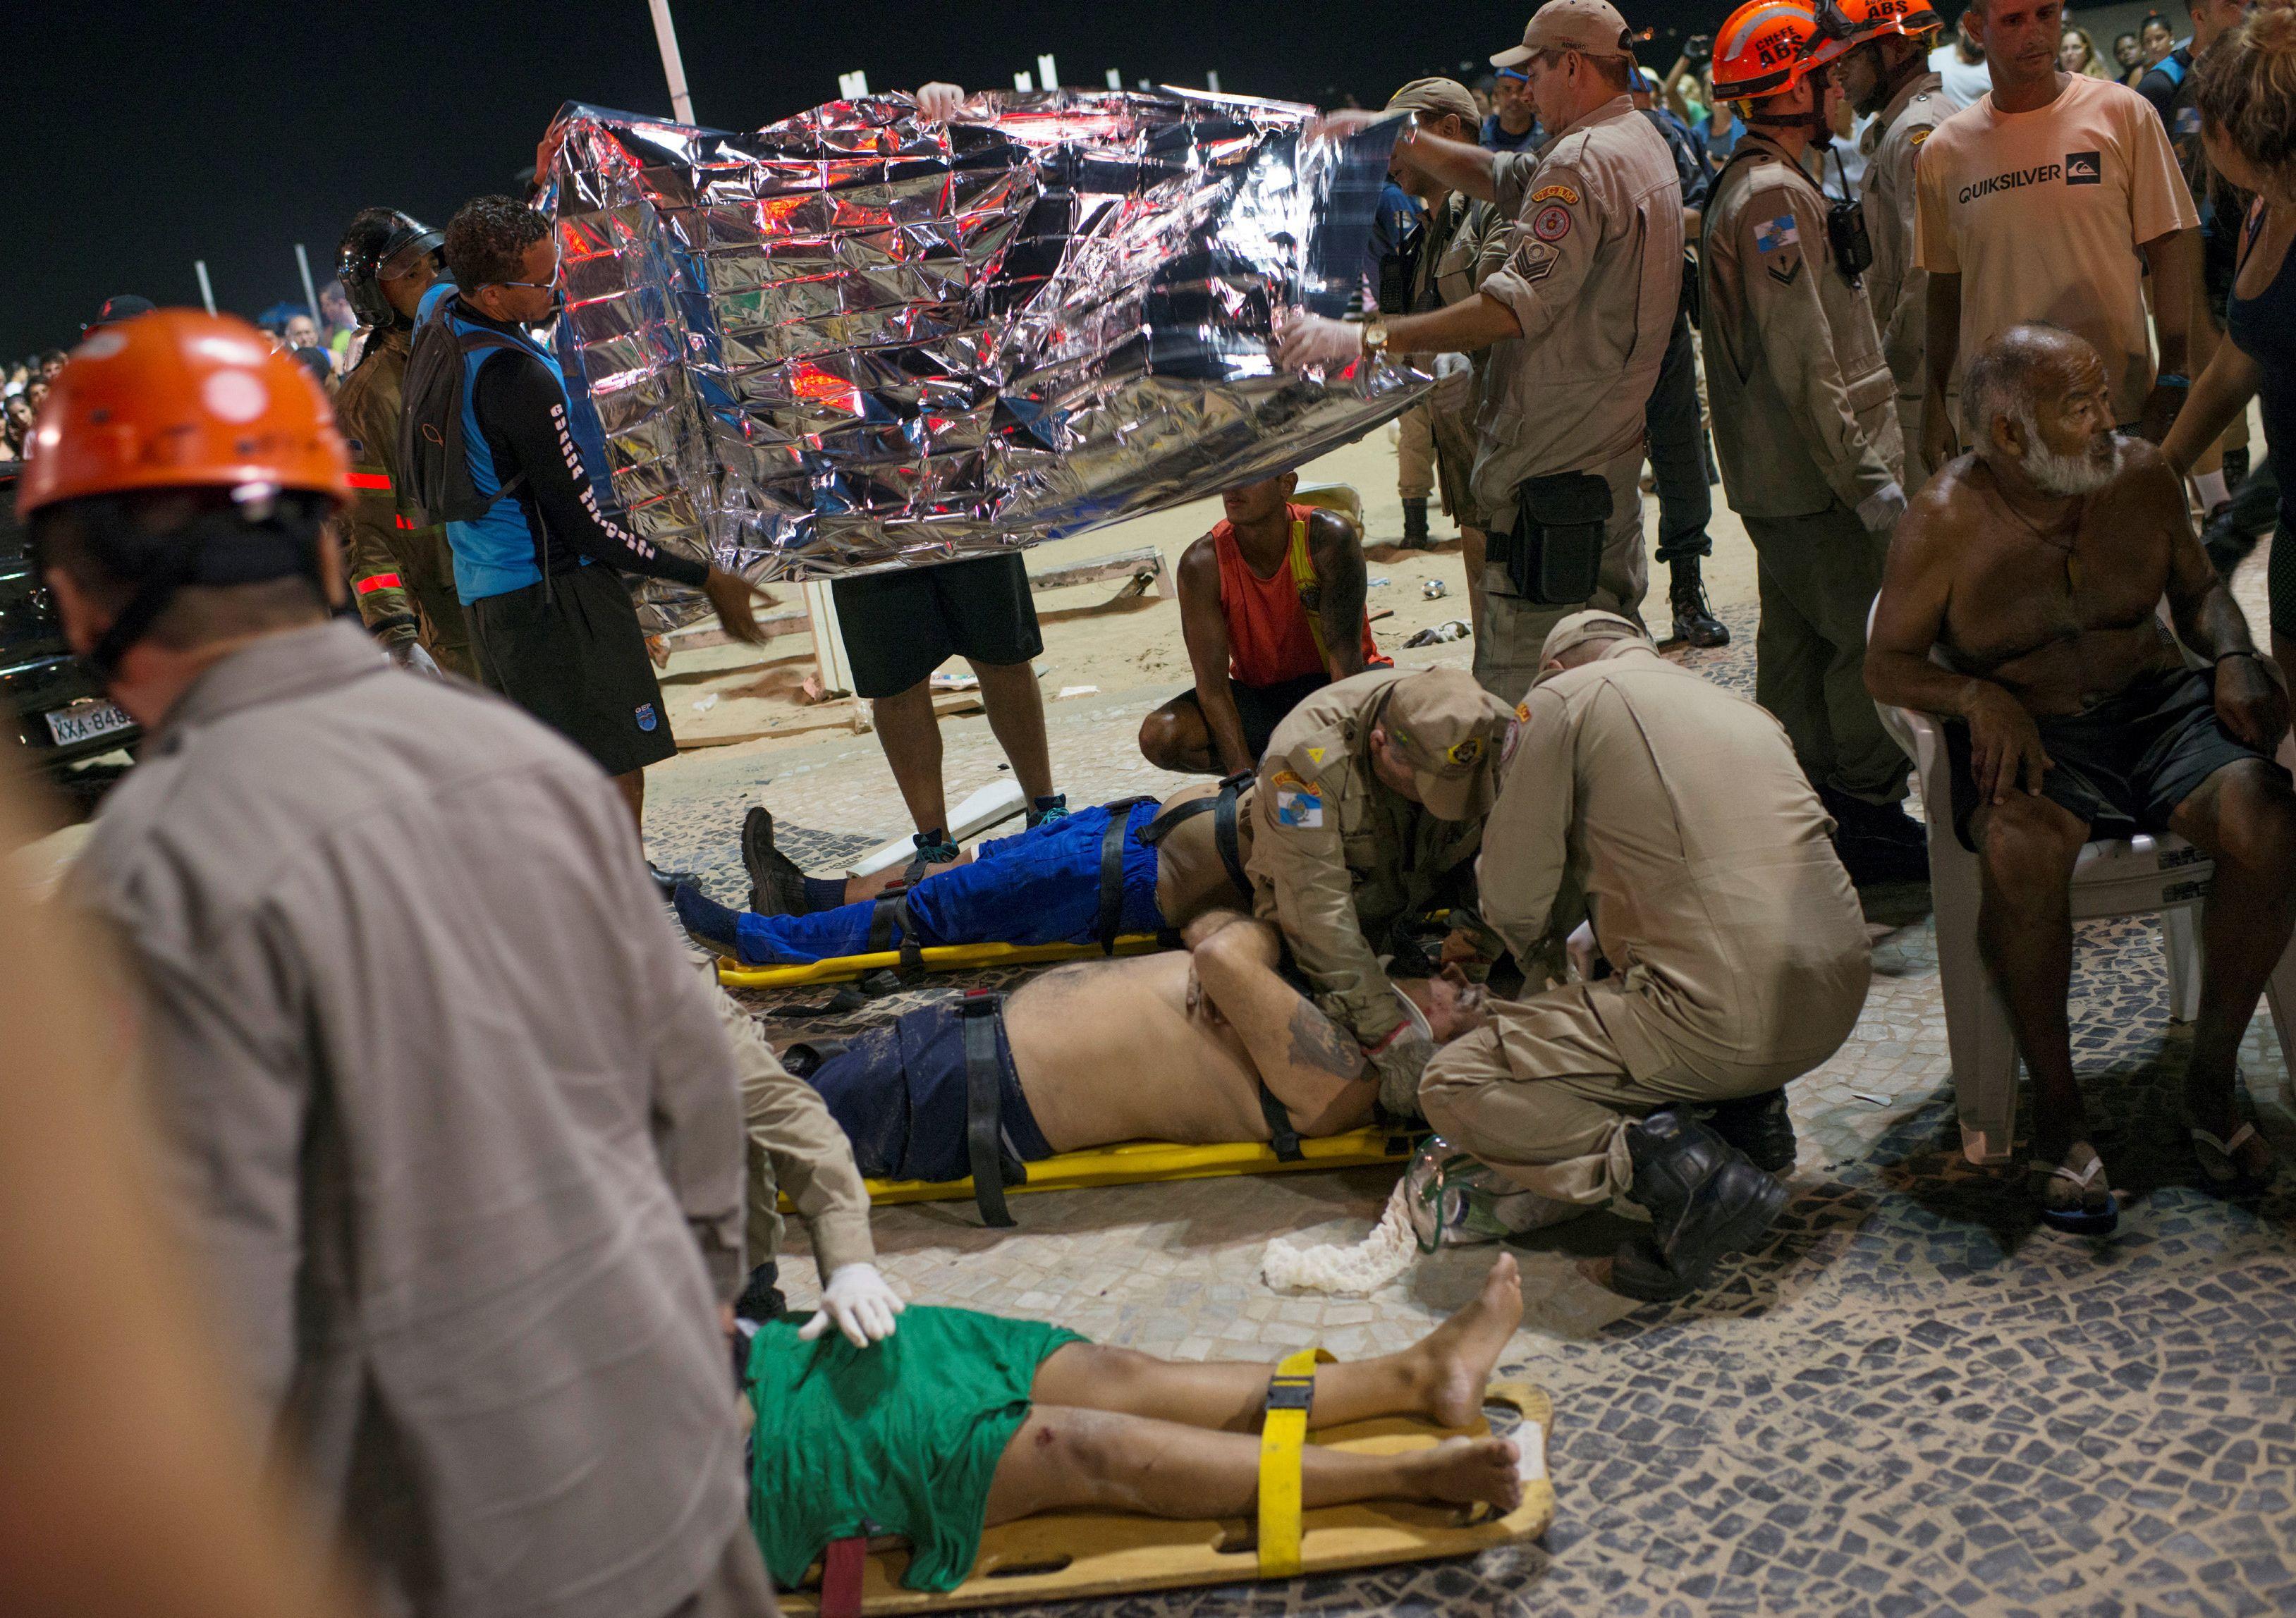 Terror em Copacabana